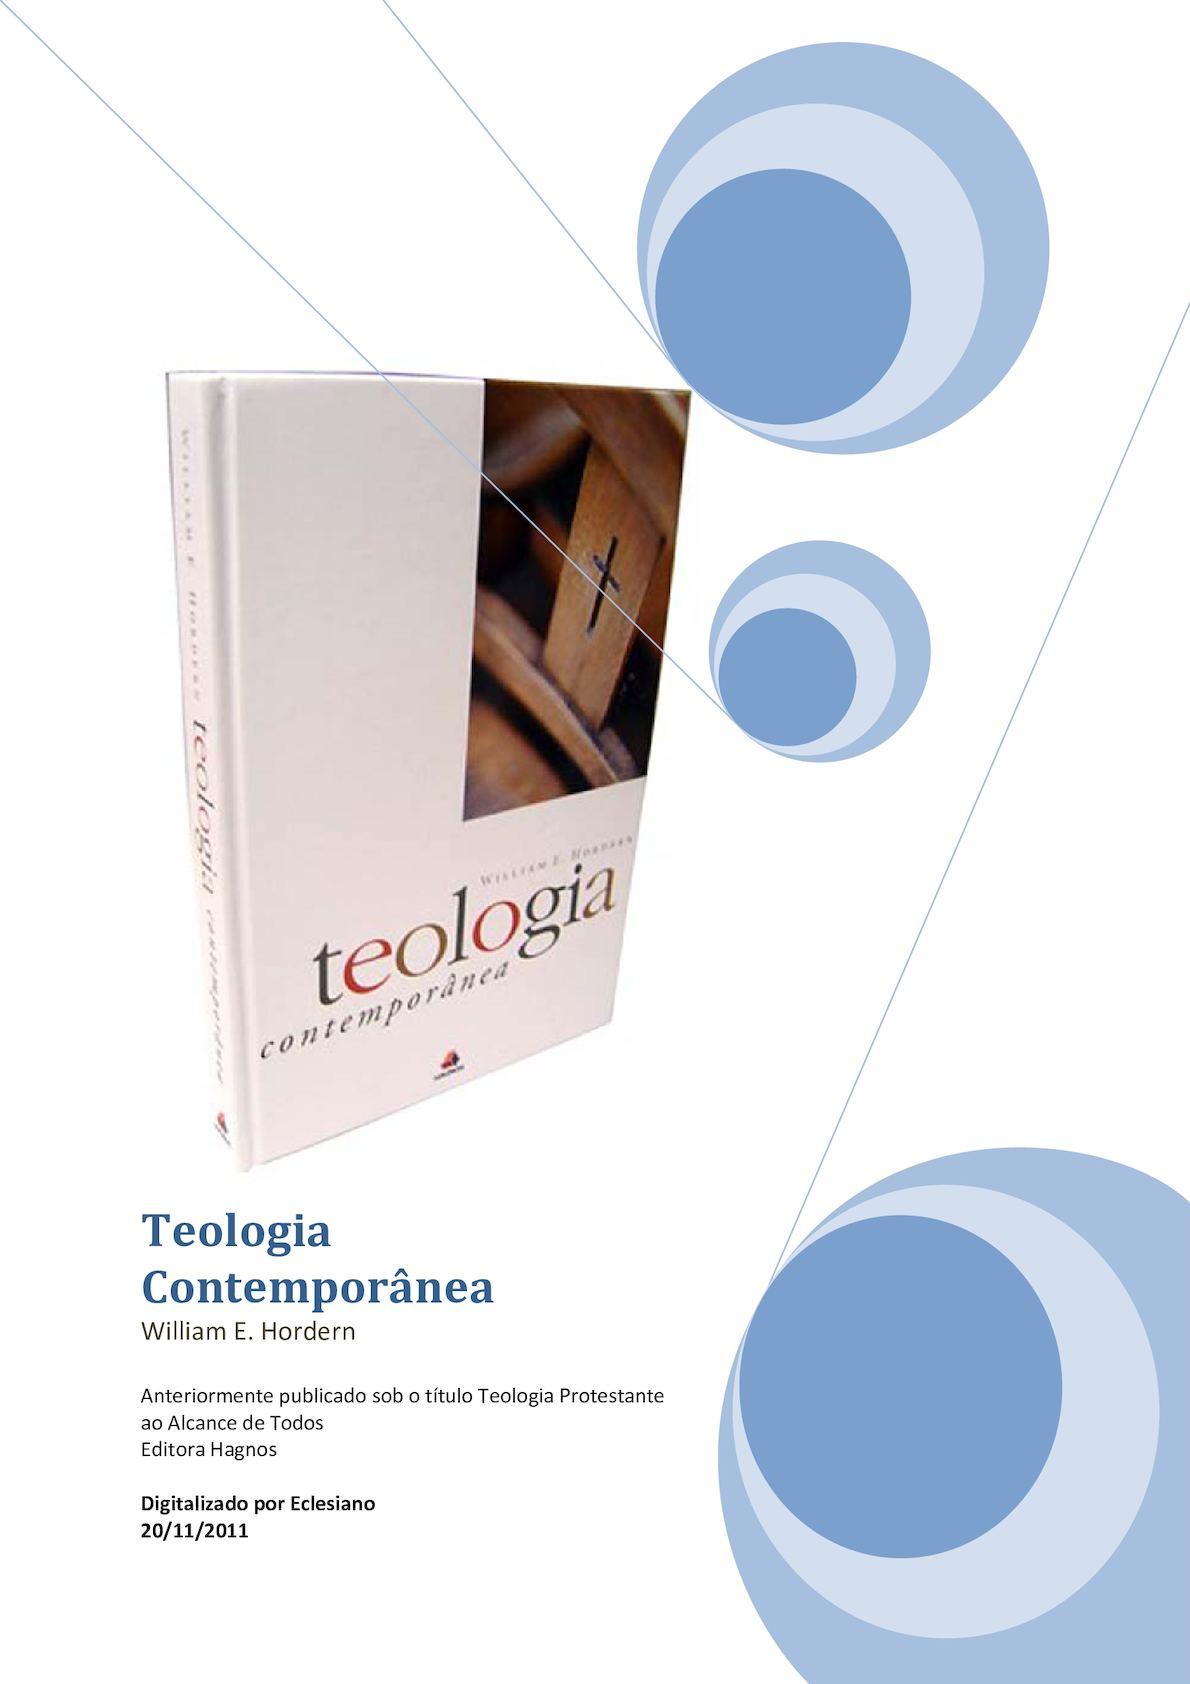 42b11dd4785 Calaméo - Teologia Contemporânea - William E. Hordern